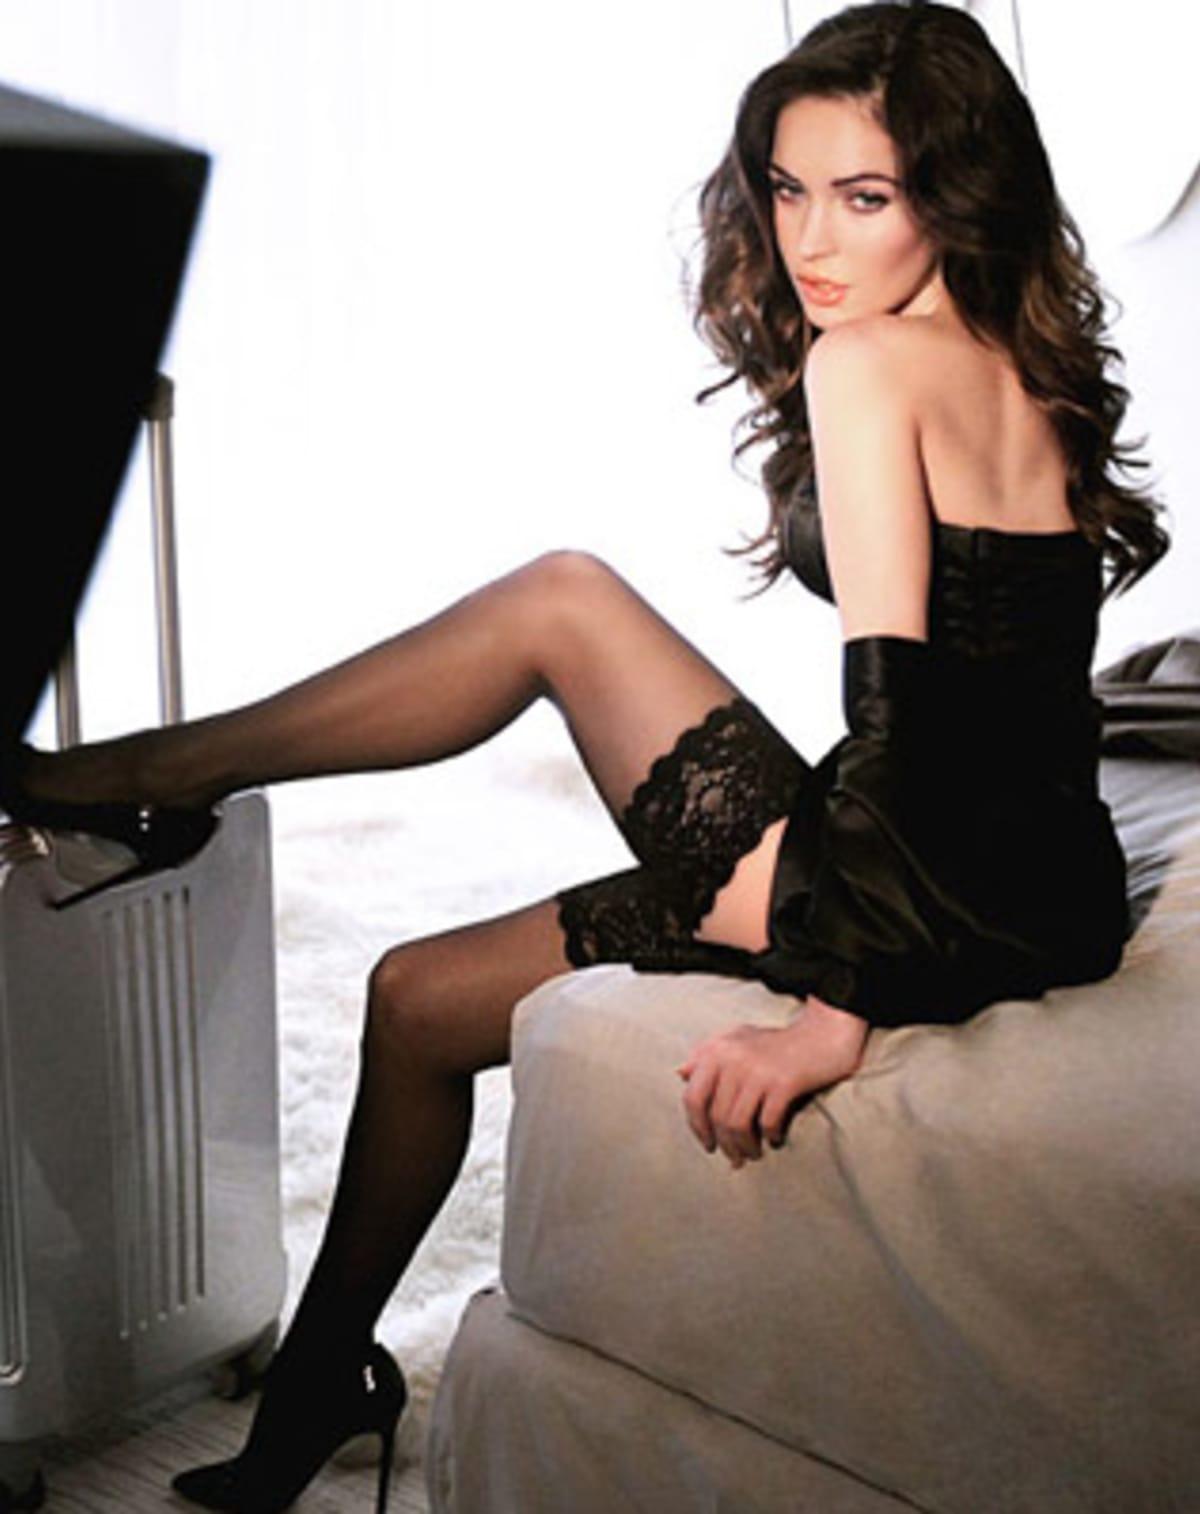 Hot sexy lingerie pics-4250